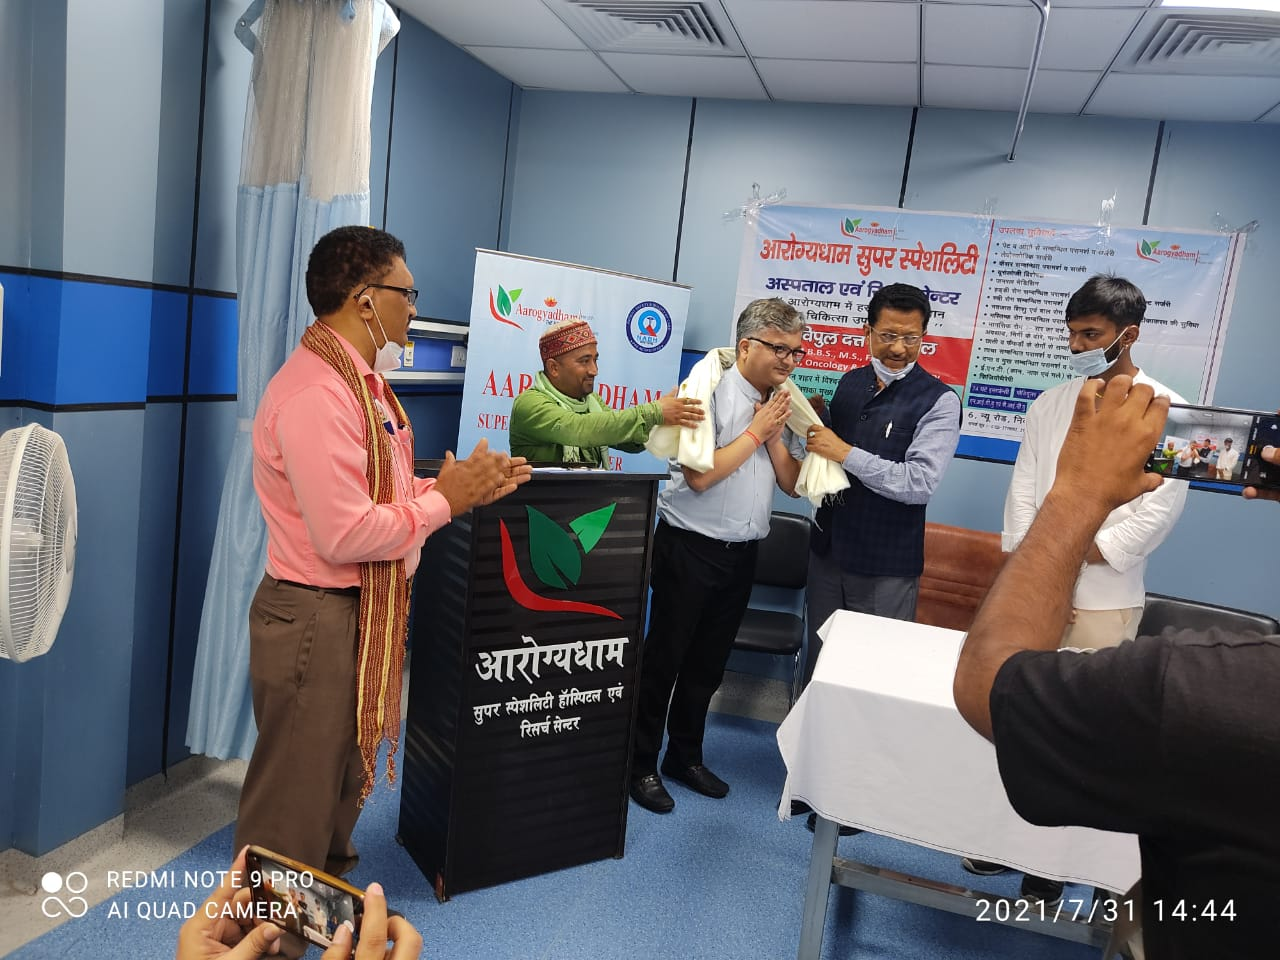 dr.vipul kandwa, best gastro surgeon and doctor in dehradun (uttarakhand)